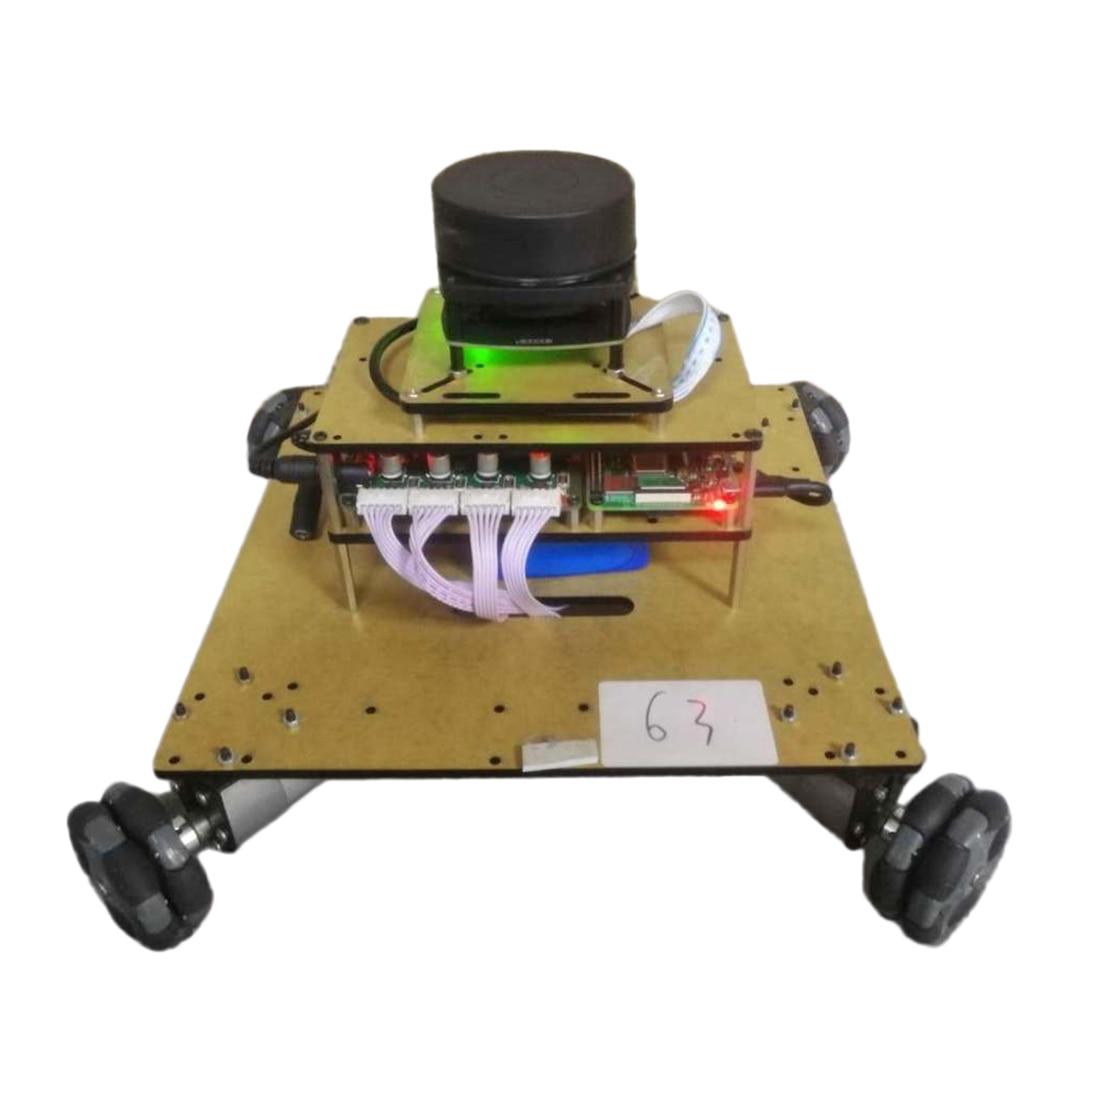 Robot Operating System Ailibot Omnidirectional Robot Car Kit For Children Kids Developmental Early Educational Toys - 04 Version